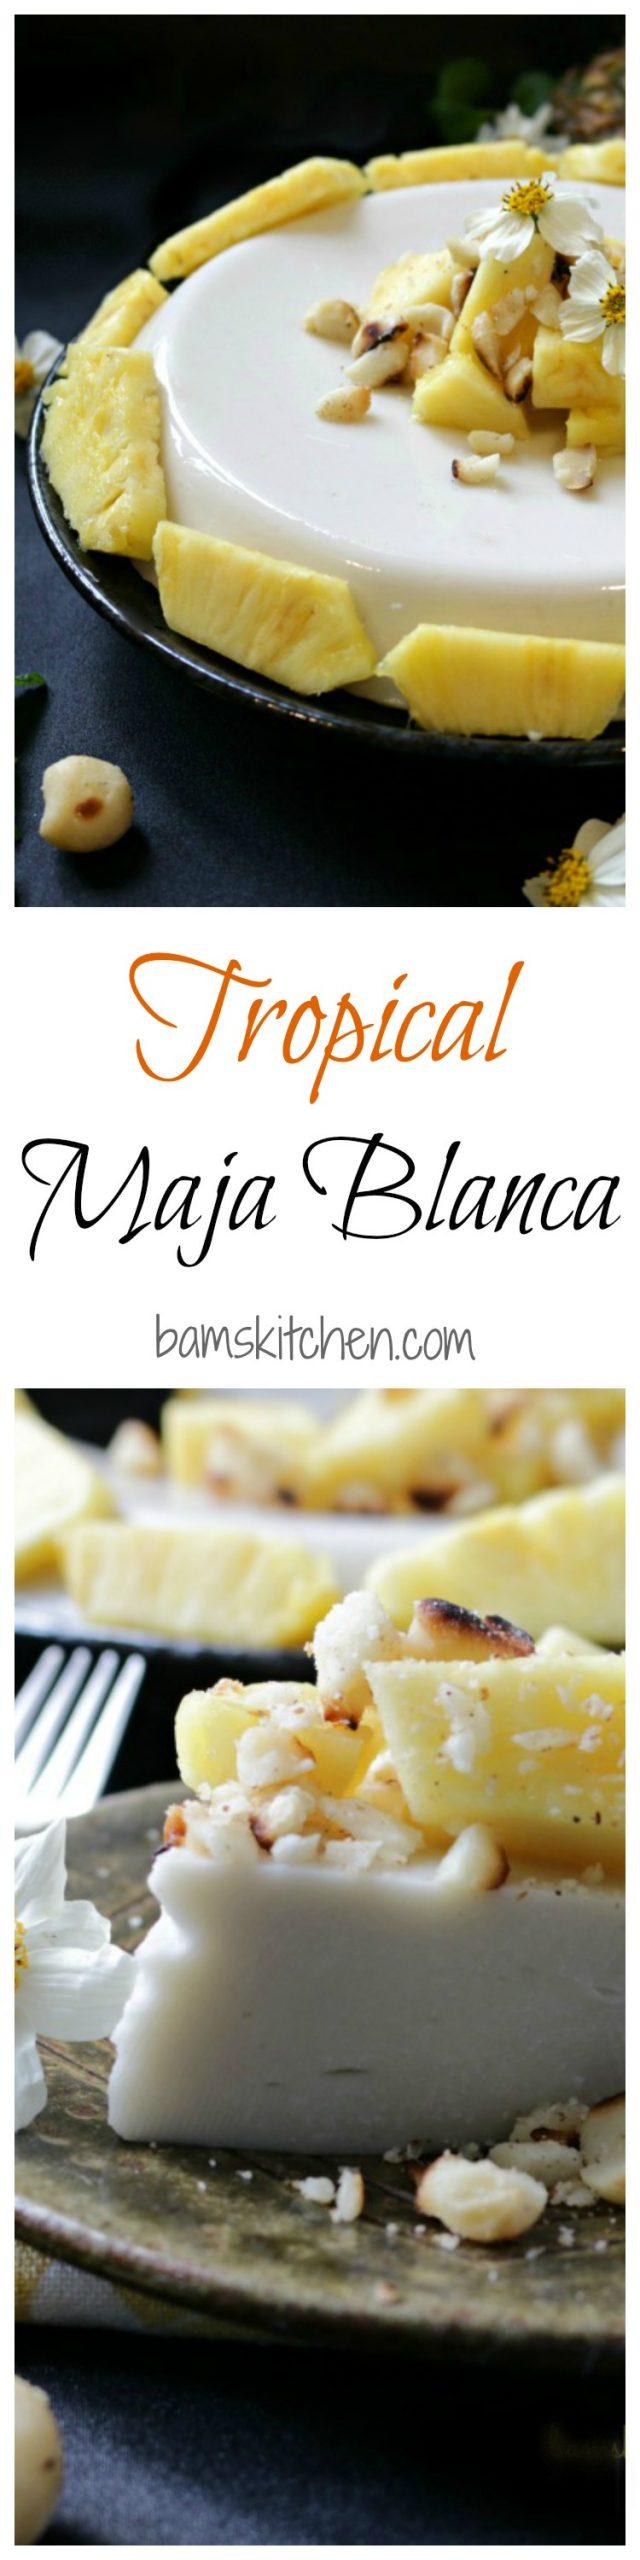 Tropical Maja Blanca / Bamskitchen.com